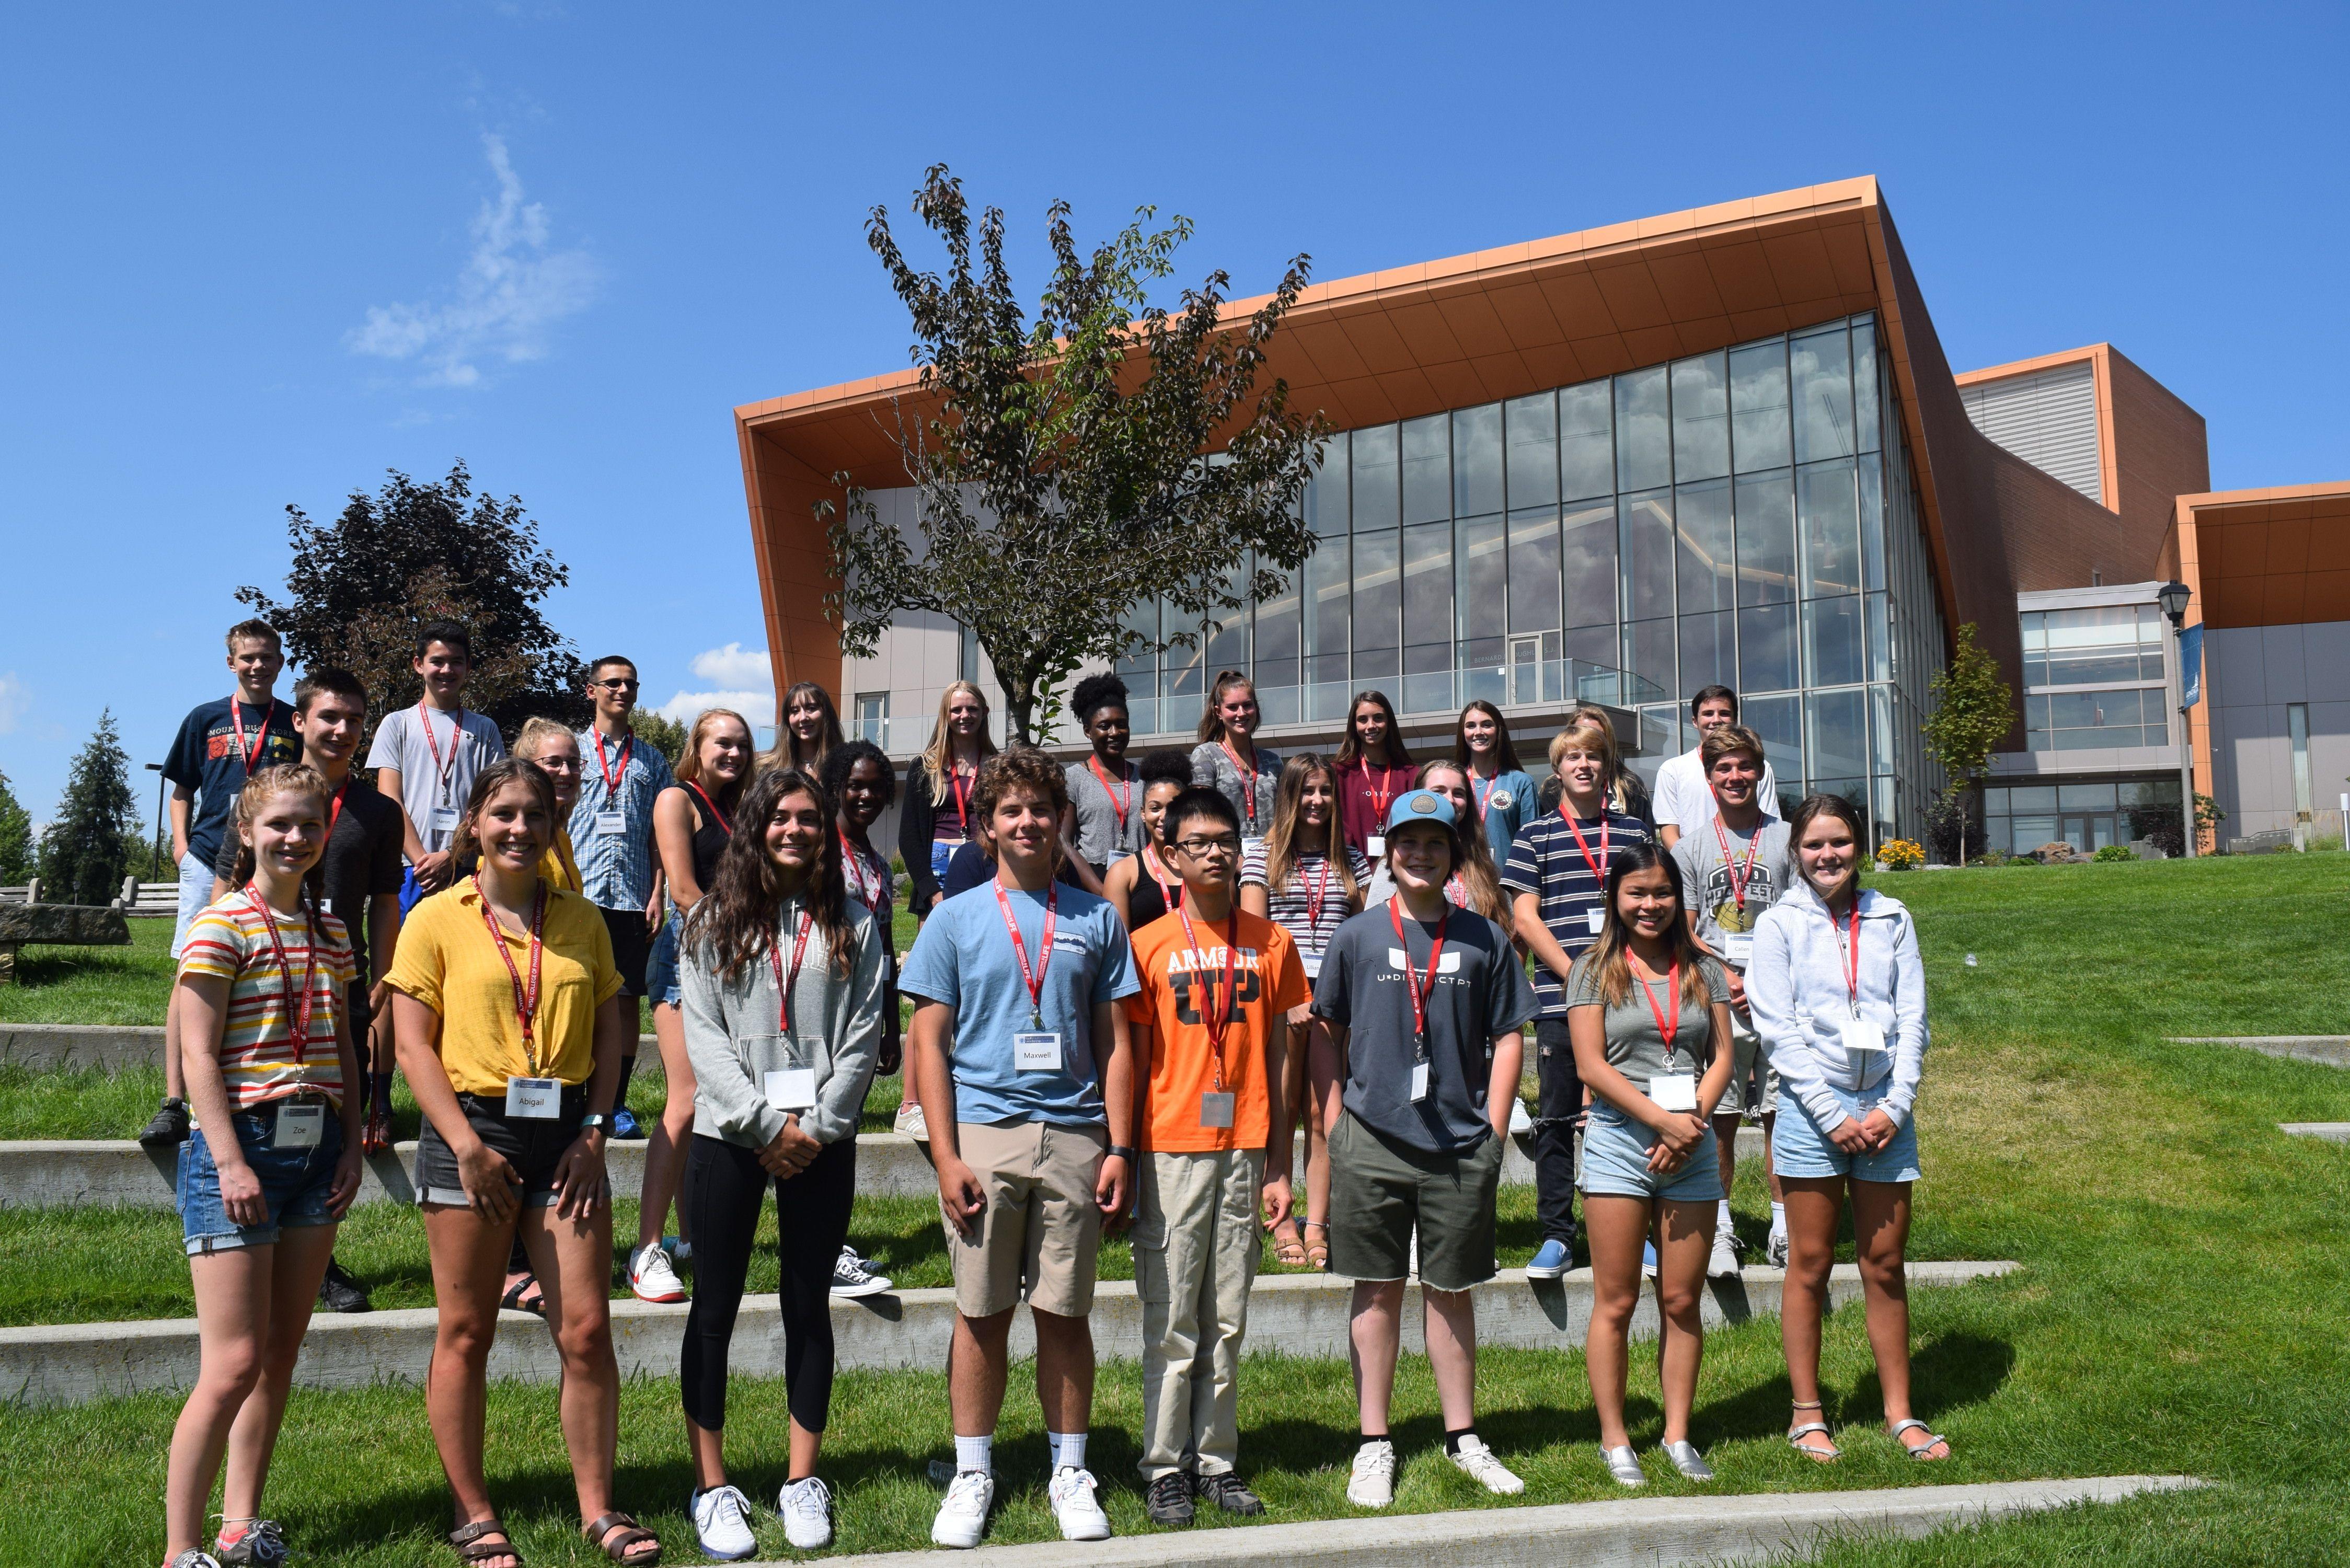 Youth Leadership Spokane